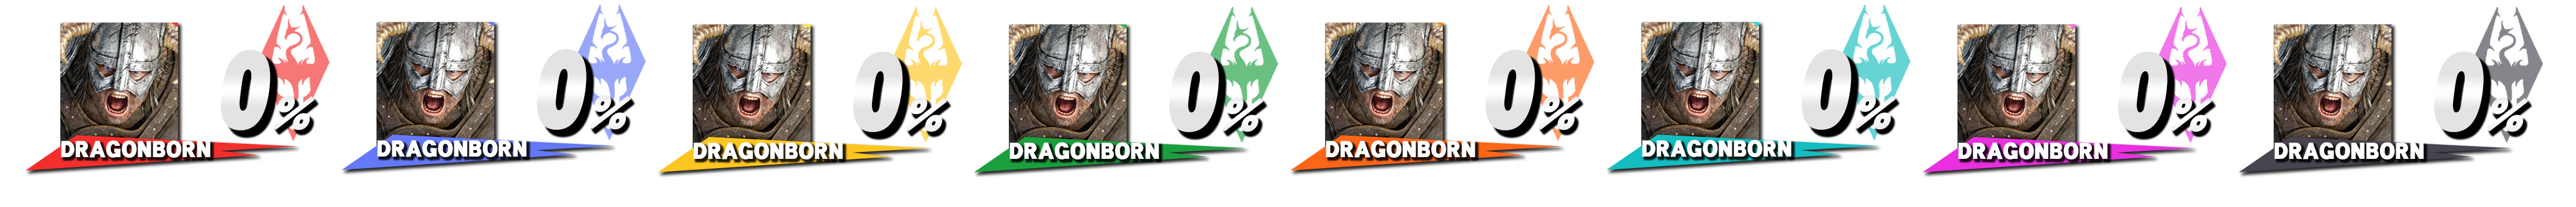 dragonborn-character-ui-8player.png